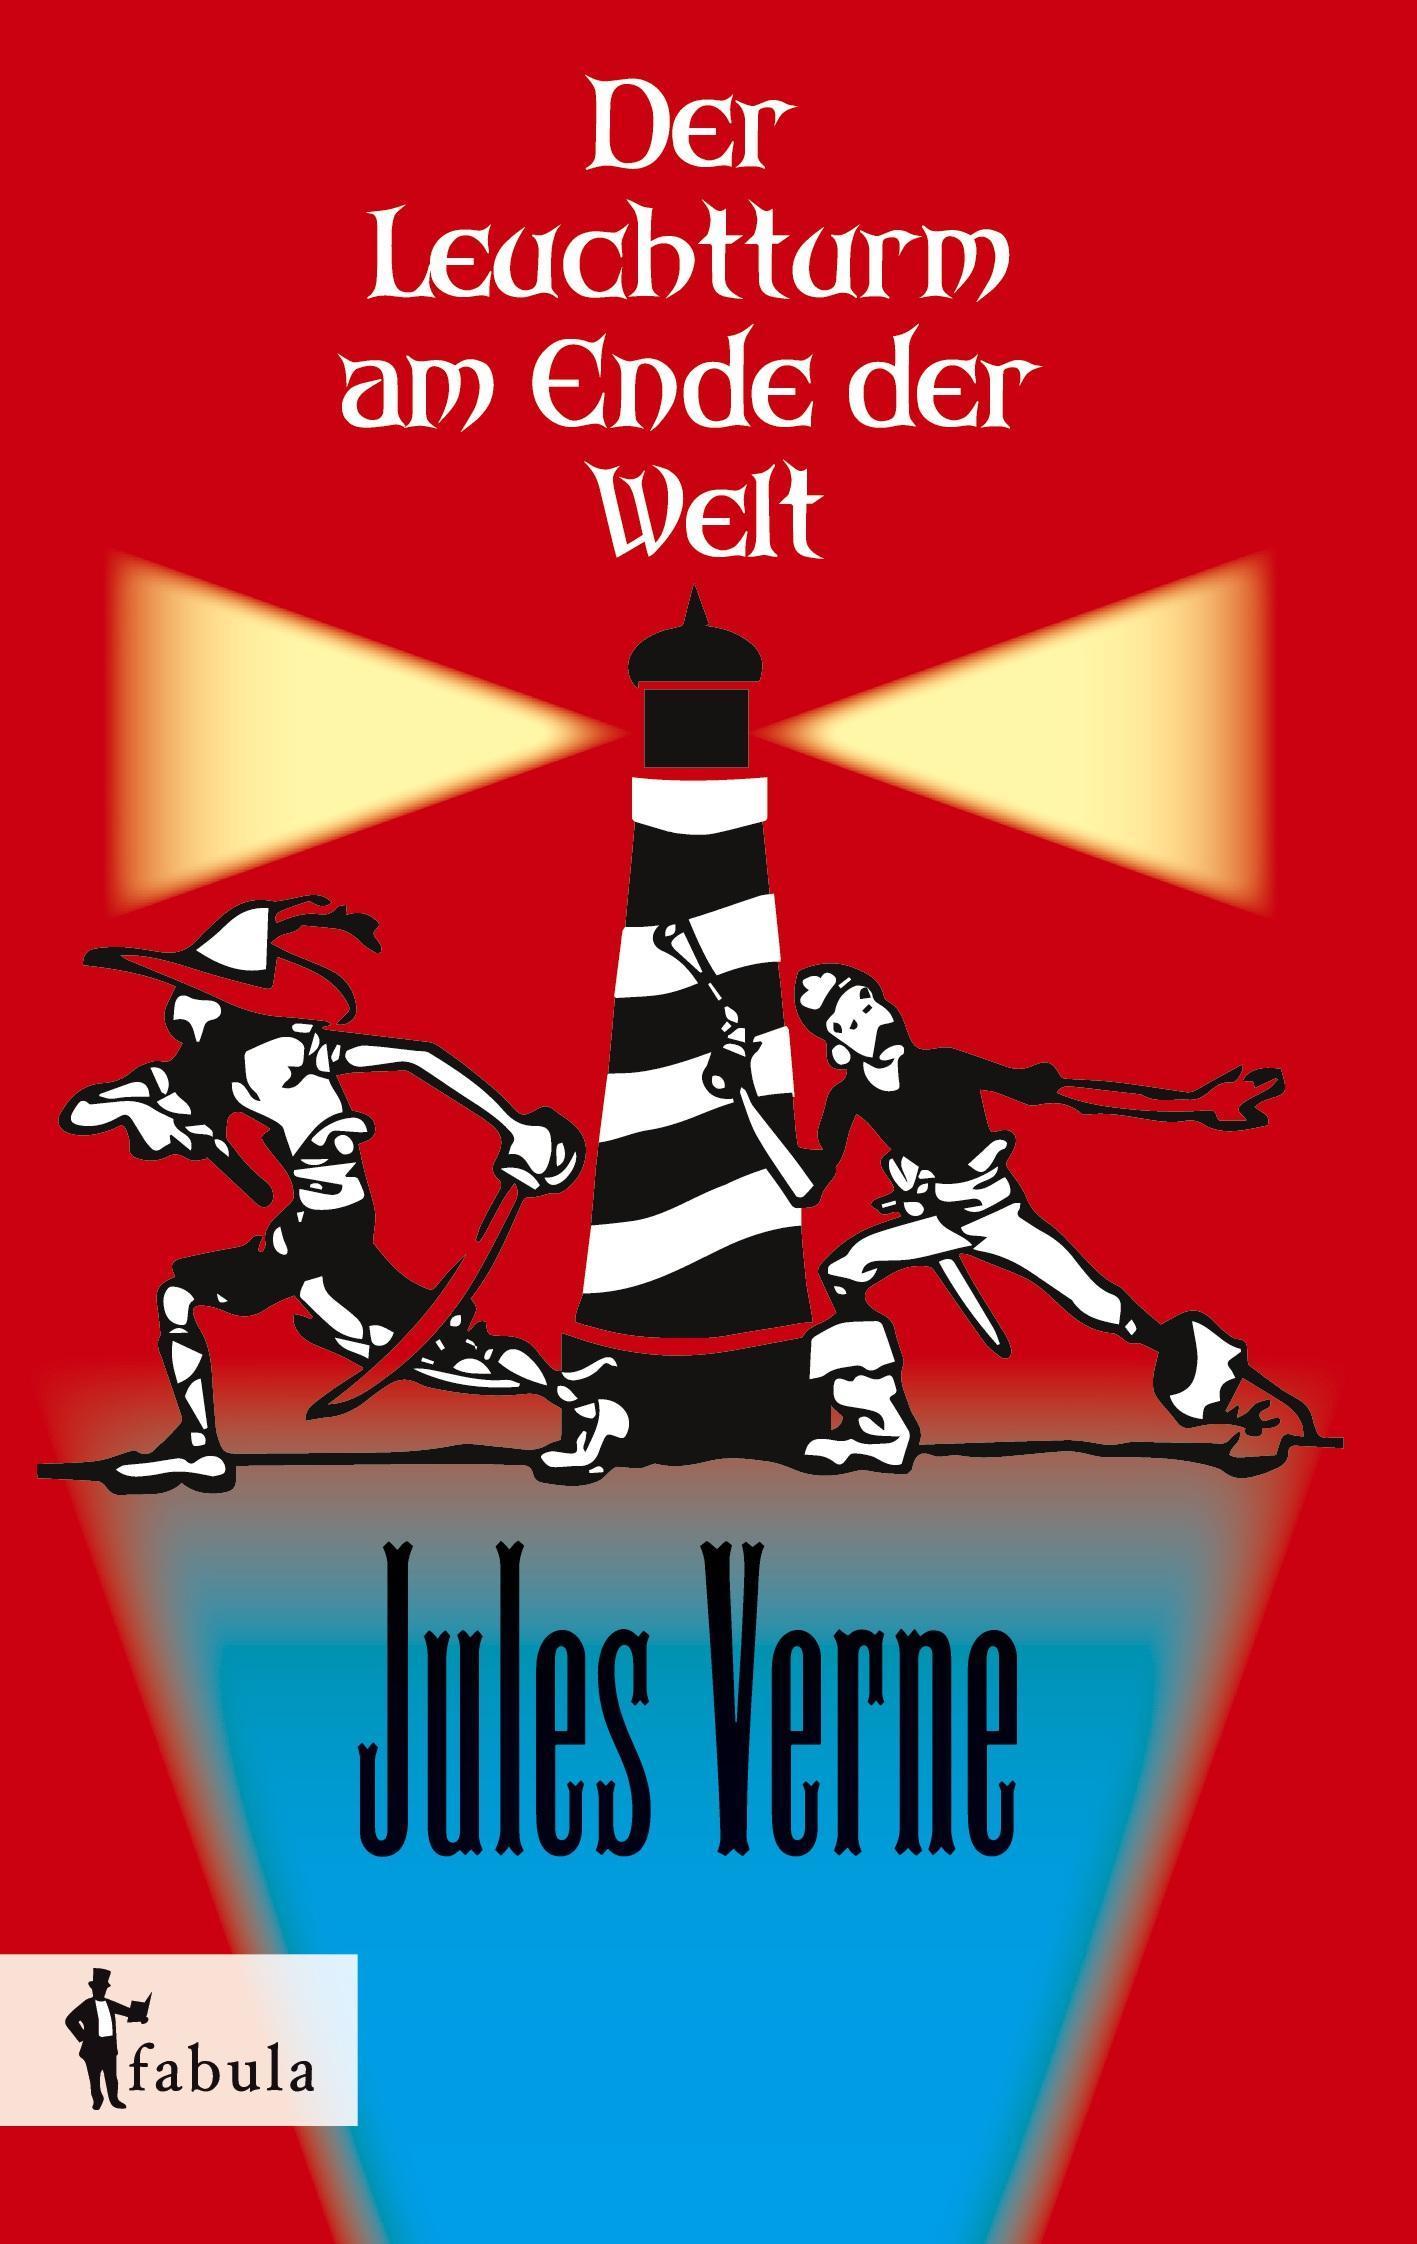 Der Leuchtturm am Ende der Welt, Jules Verne